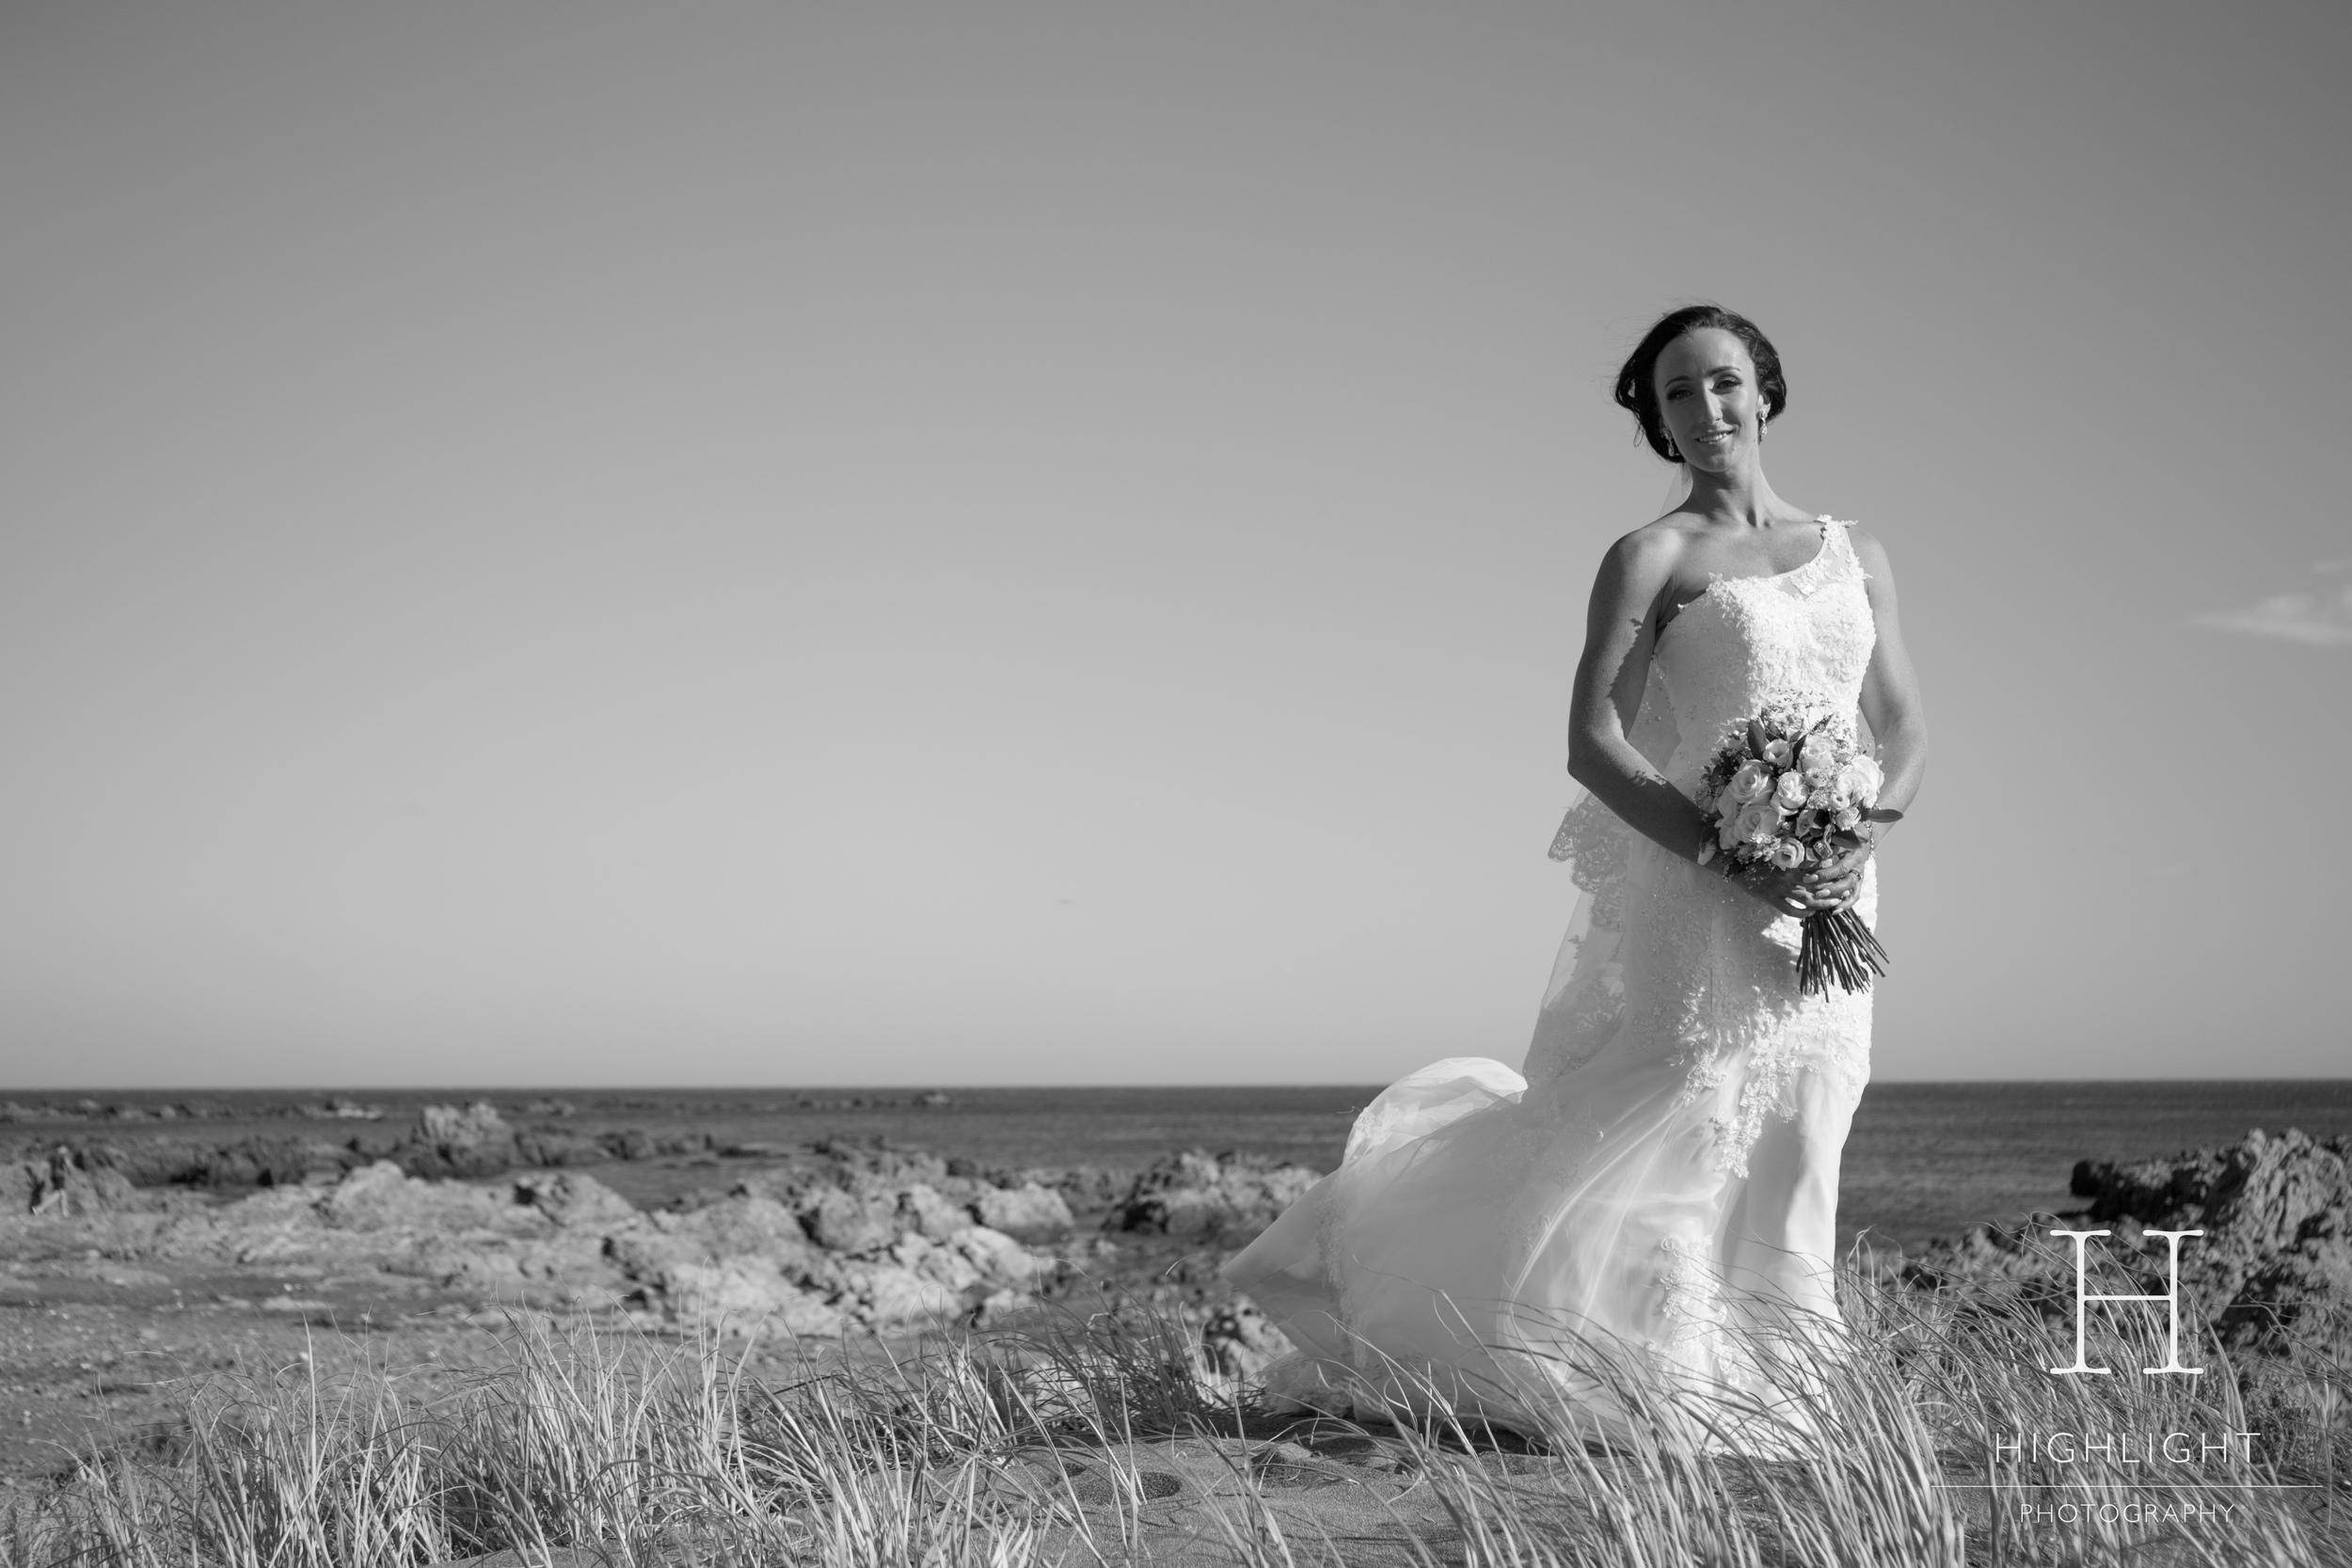 highlight_kc_bw_bride_beach_wellington.jpg